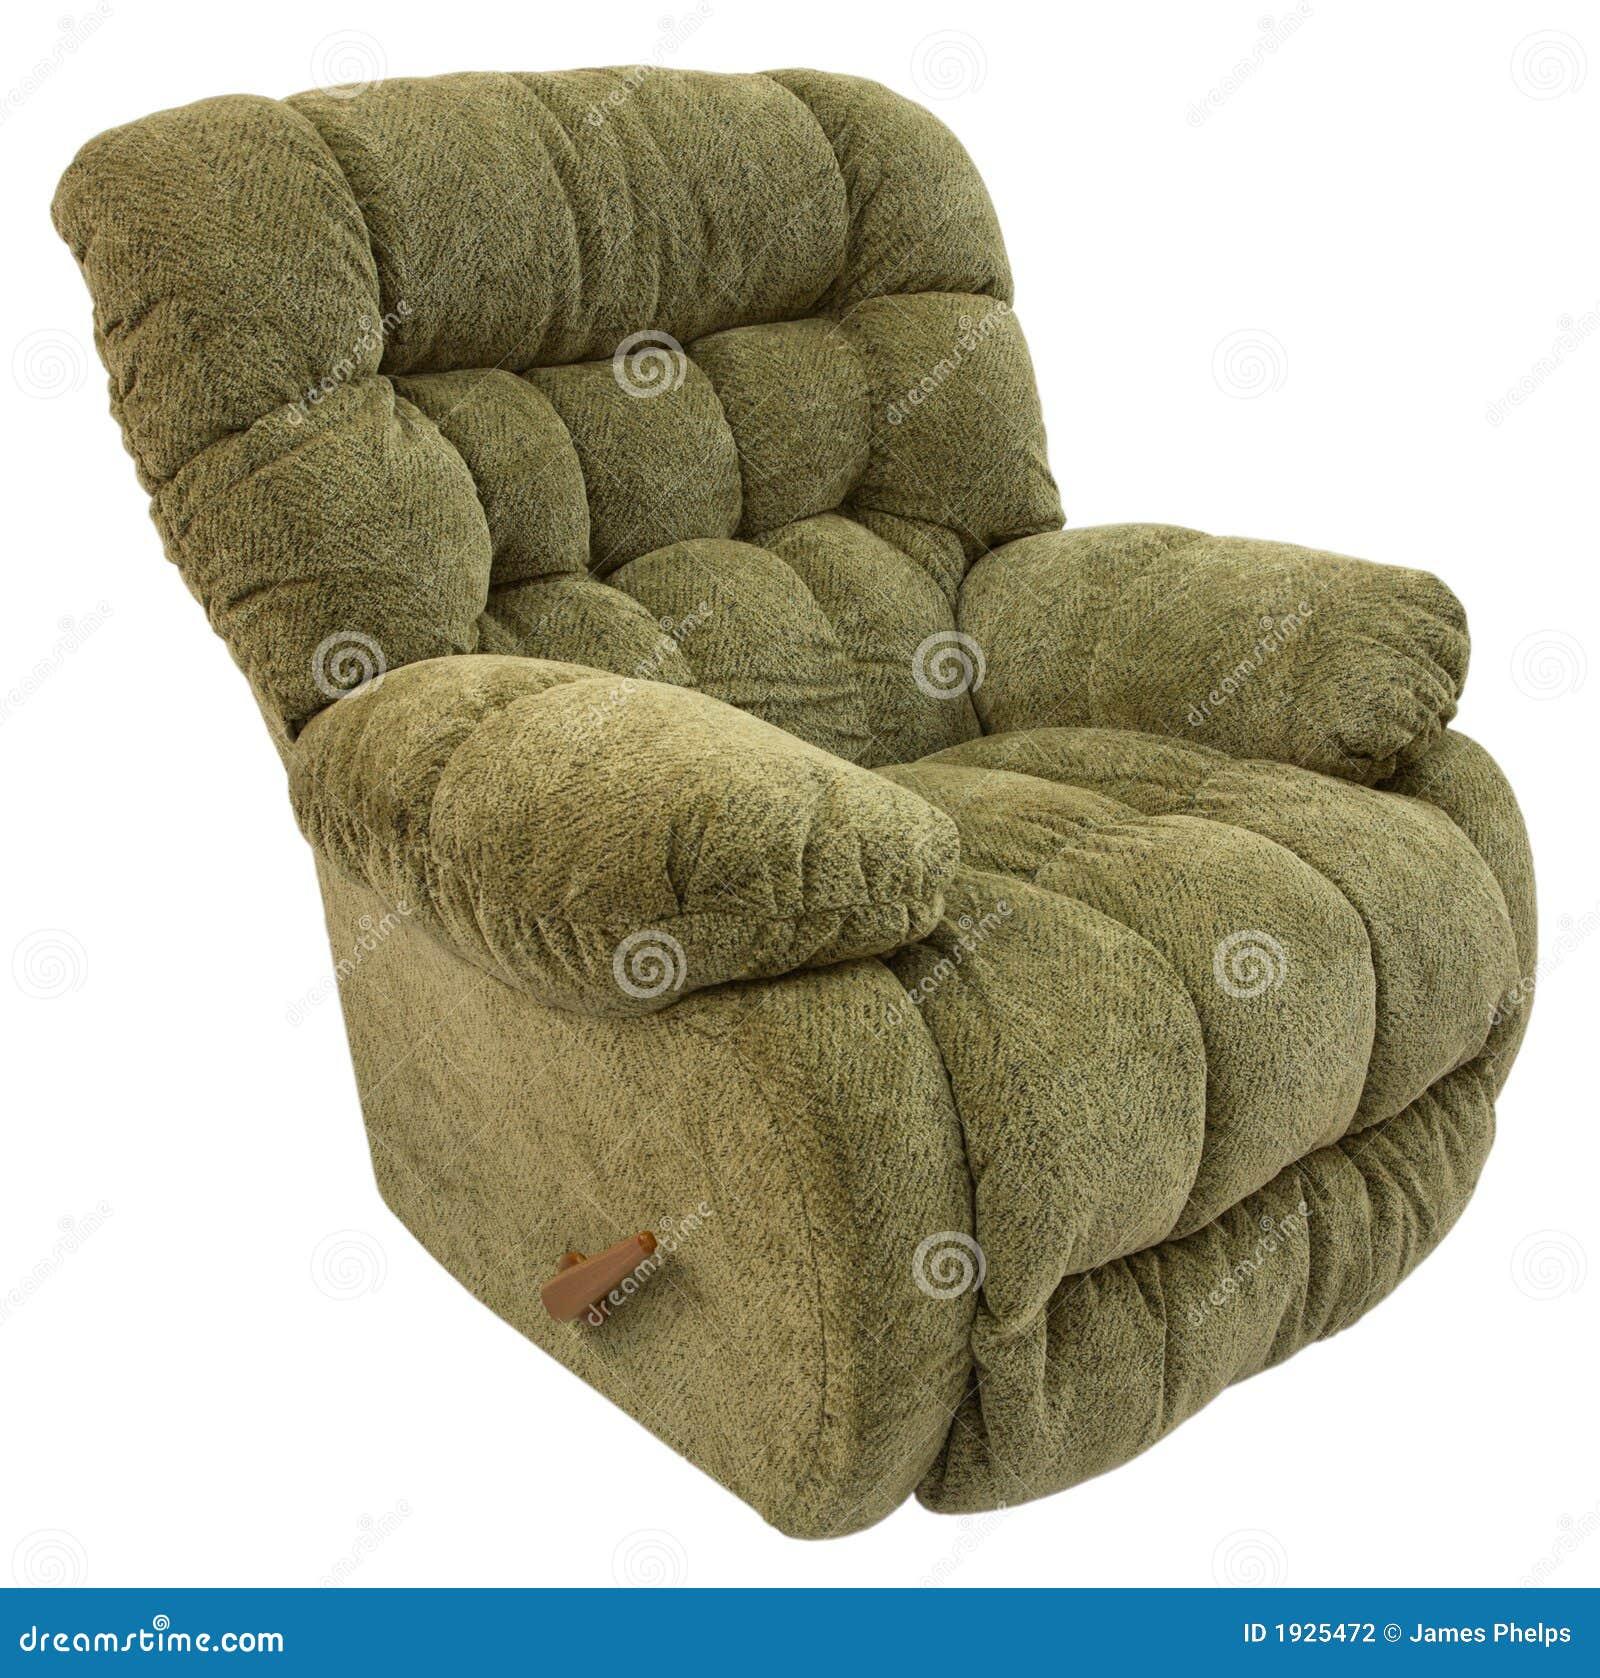 大长毛绒可躺式椅摇摆物